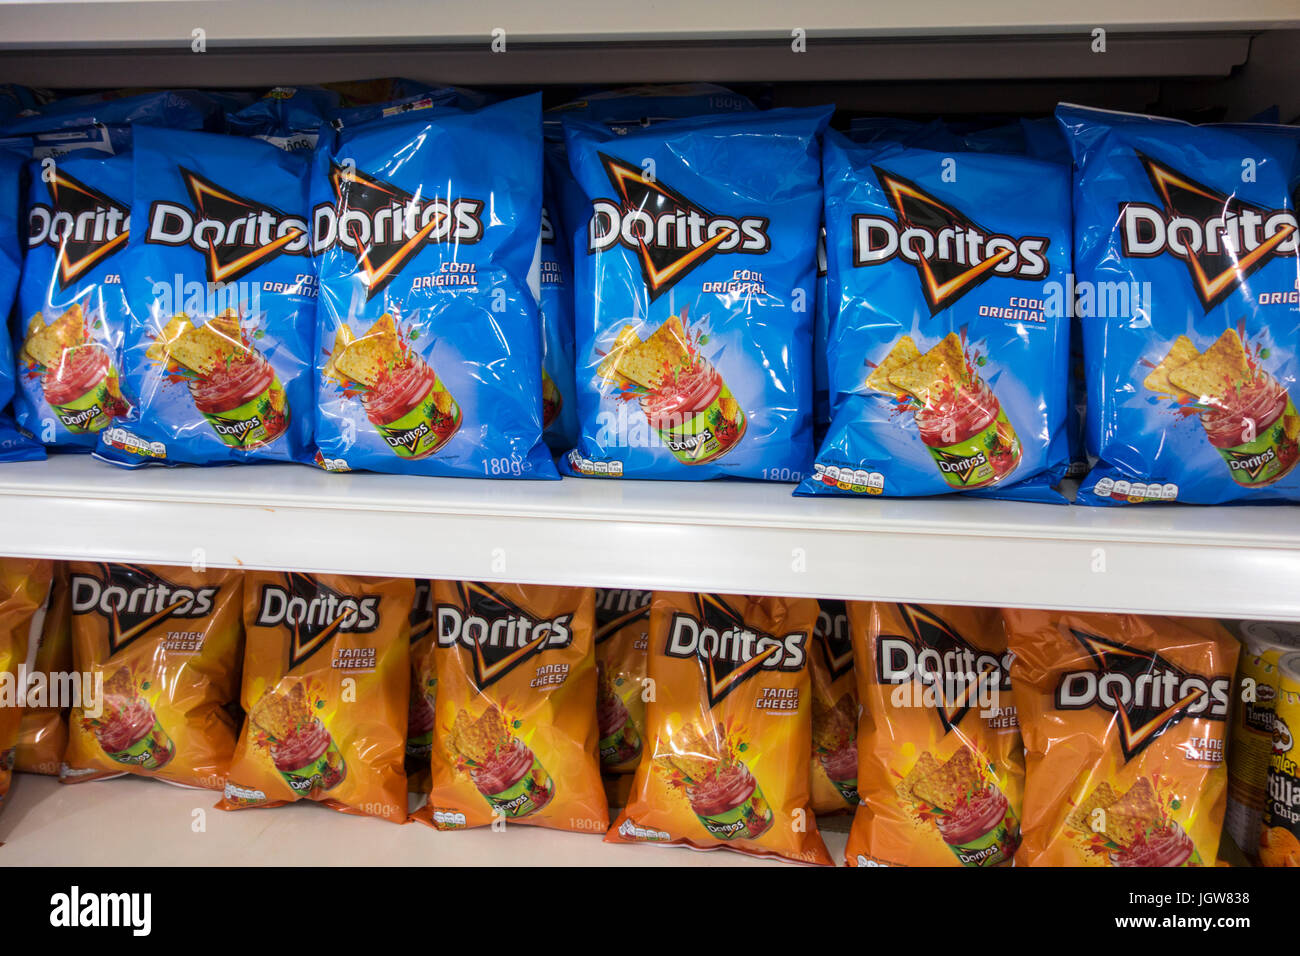 Bags of Doritos tortilla crisps for sale on a supermarket shelf in the UK - Stock Image